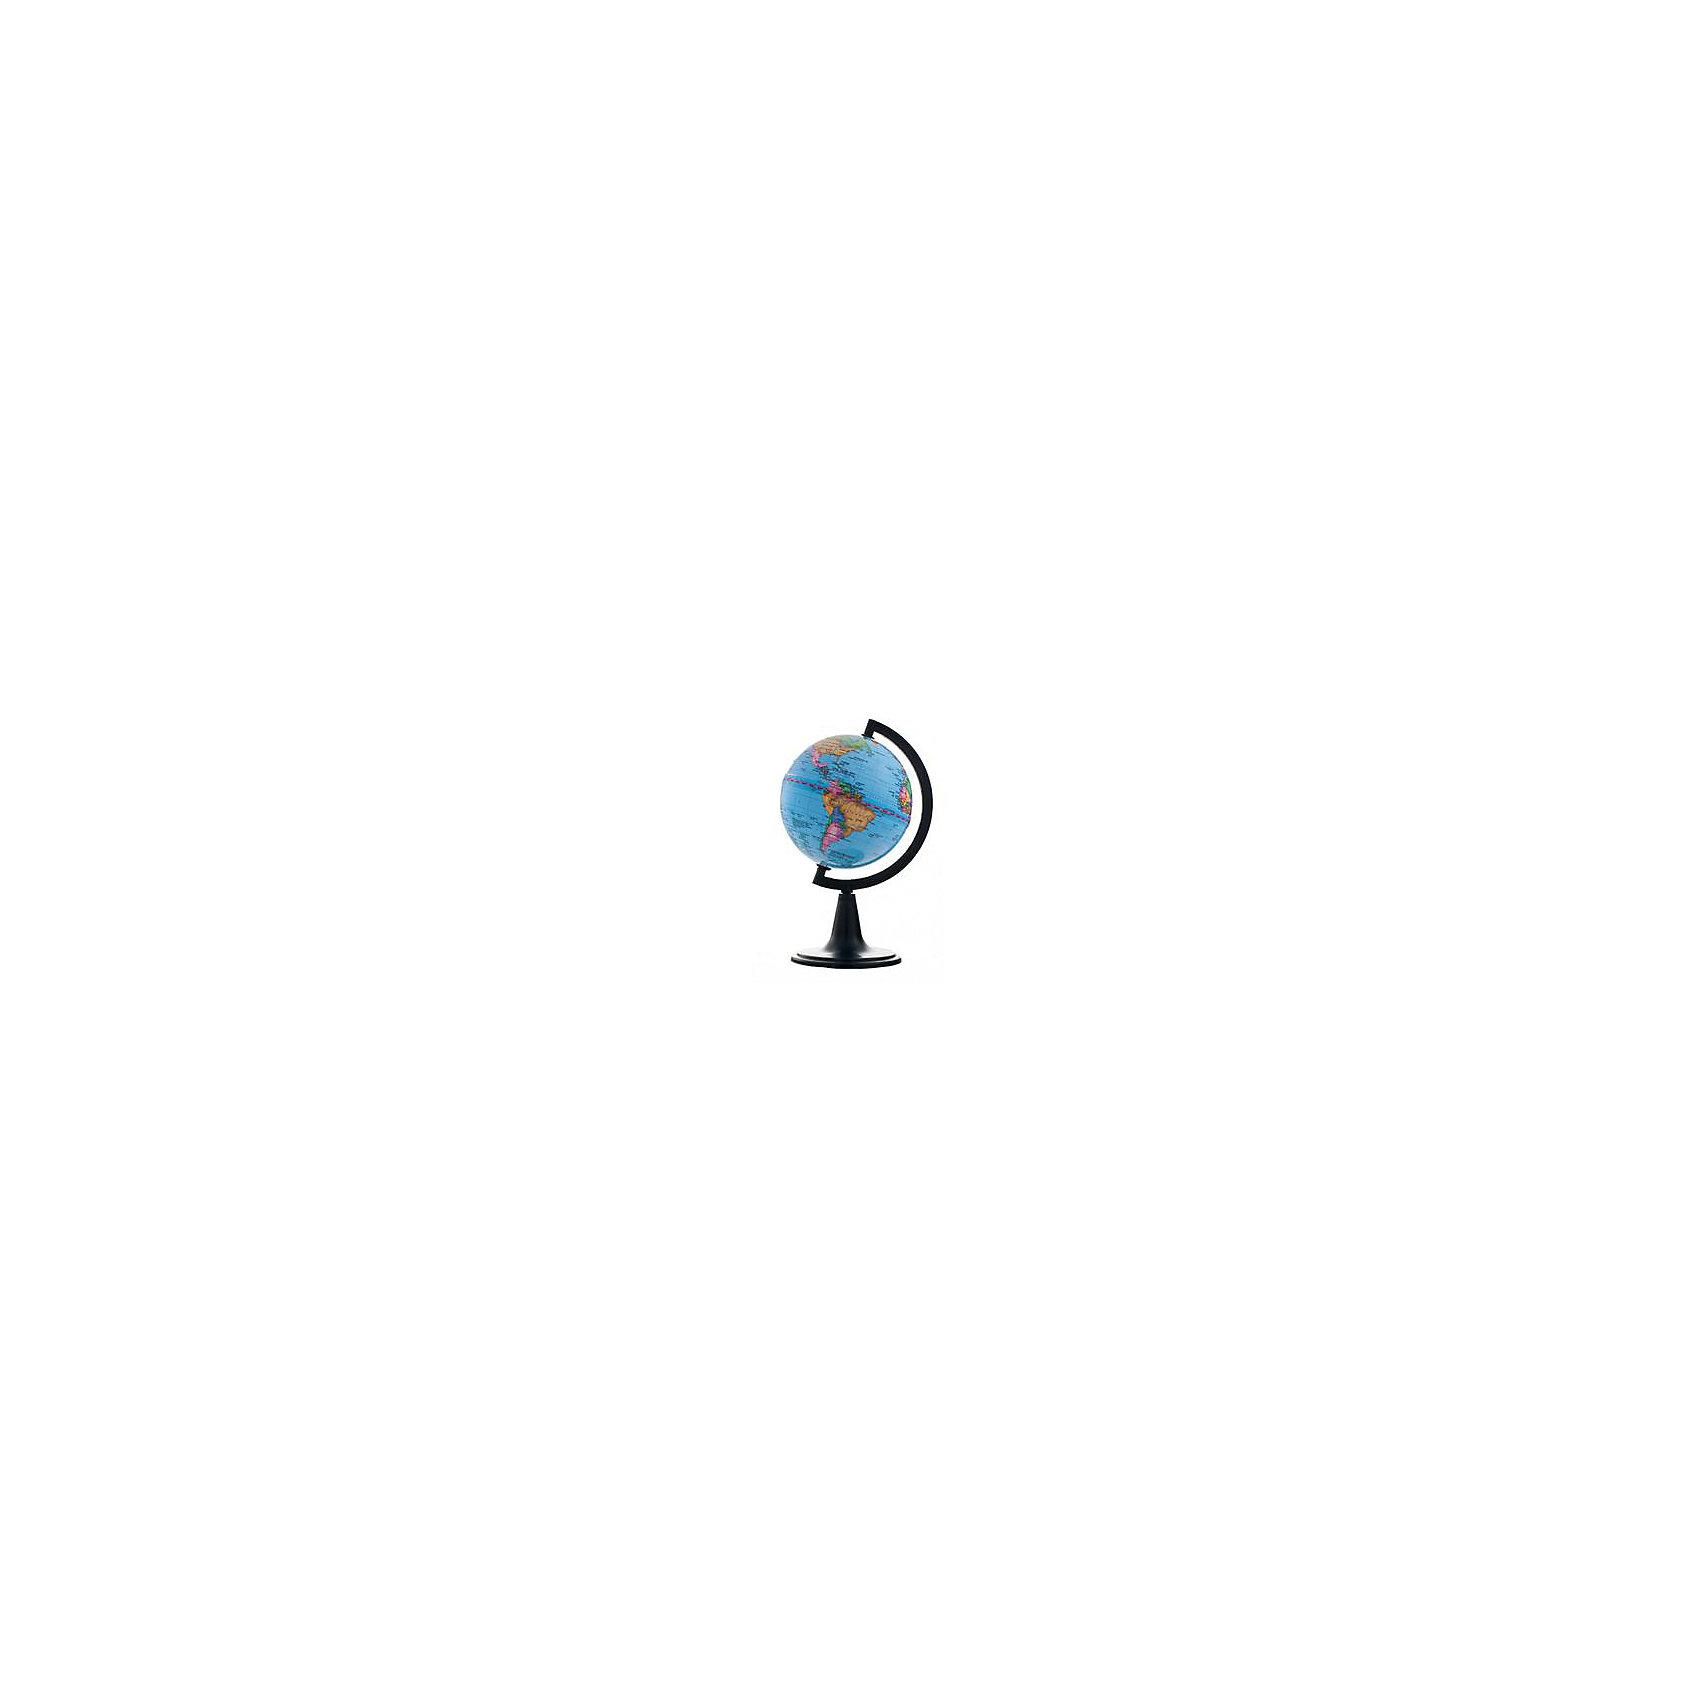 Глобус Земли политический, диаметр 120 ммДиаметр: 120 мм<br><br>Масштаб: 1:106000000<br><br>Материал подставки: Пластик<br><br>Цвет подставки: Черный<br><br>Ширина мм: 468<br>Глубина мм: 468<br>Высота мм: 435<br>Вес г: 180<br>Возраст от месяцев: 72<br>Возраст до месяцев: 2147483647<br>Пол: Унисекс<br>Возраст: Детский<br>SKU: 5518222